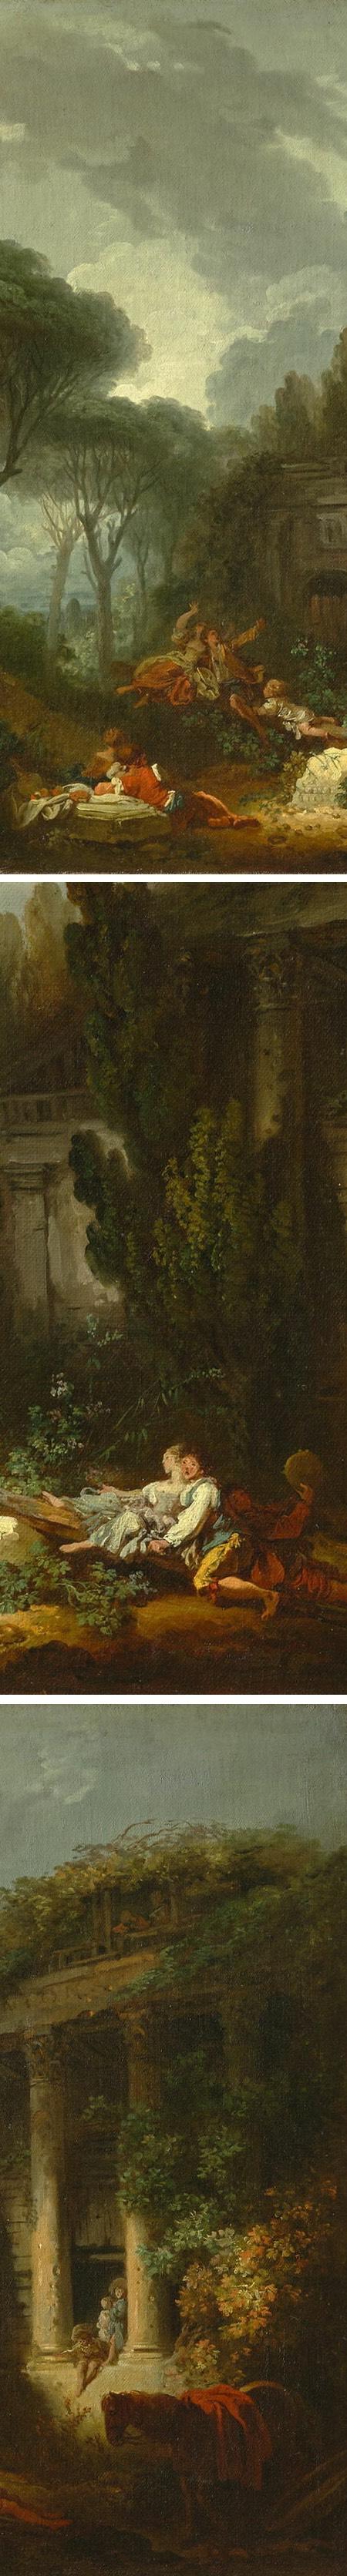 La Bascule, Jean-Honore Fragonard (details)